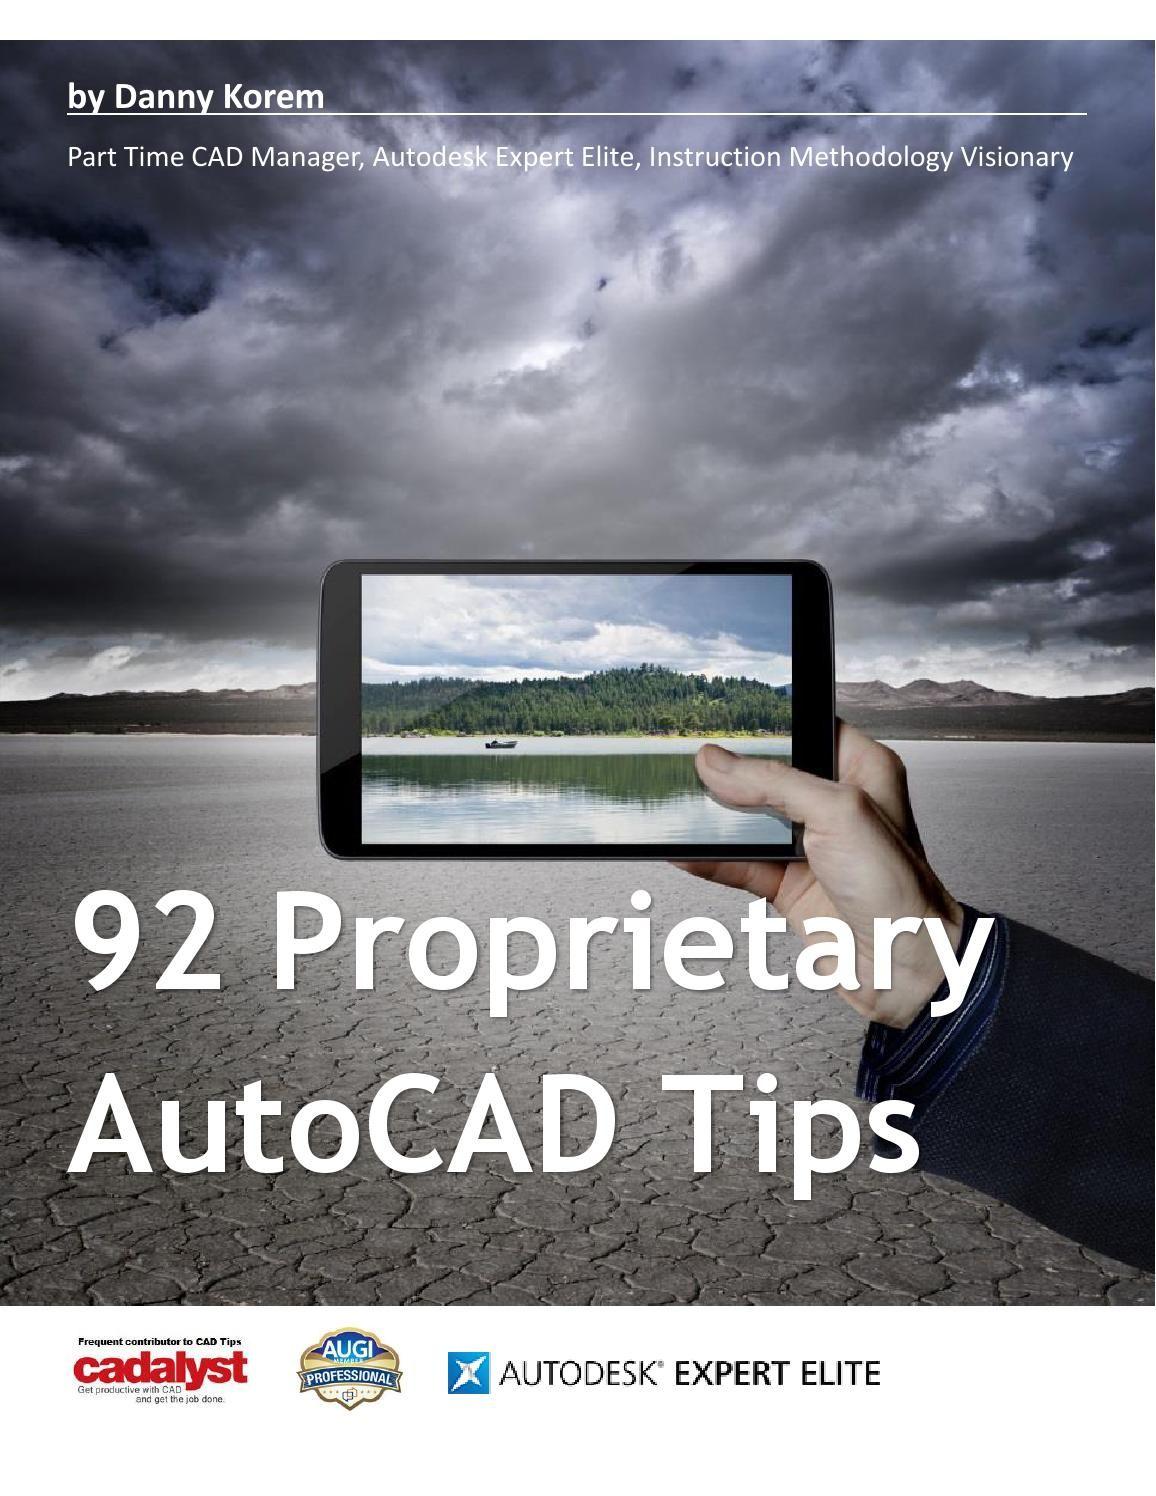 Best CAD Software of 2019 - toptenreviews.com